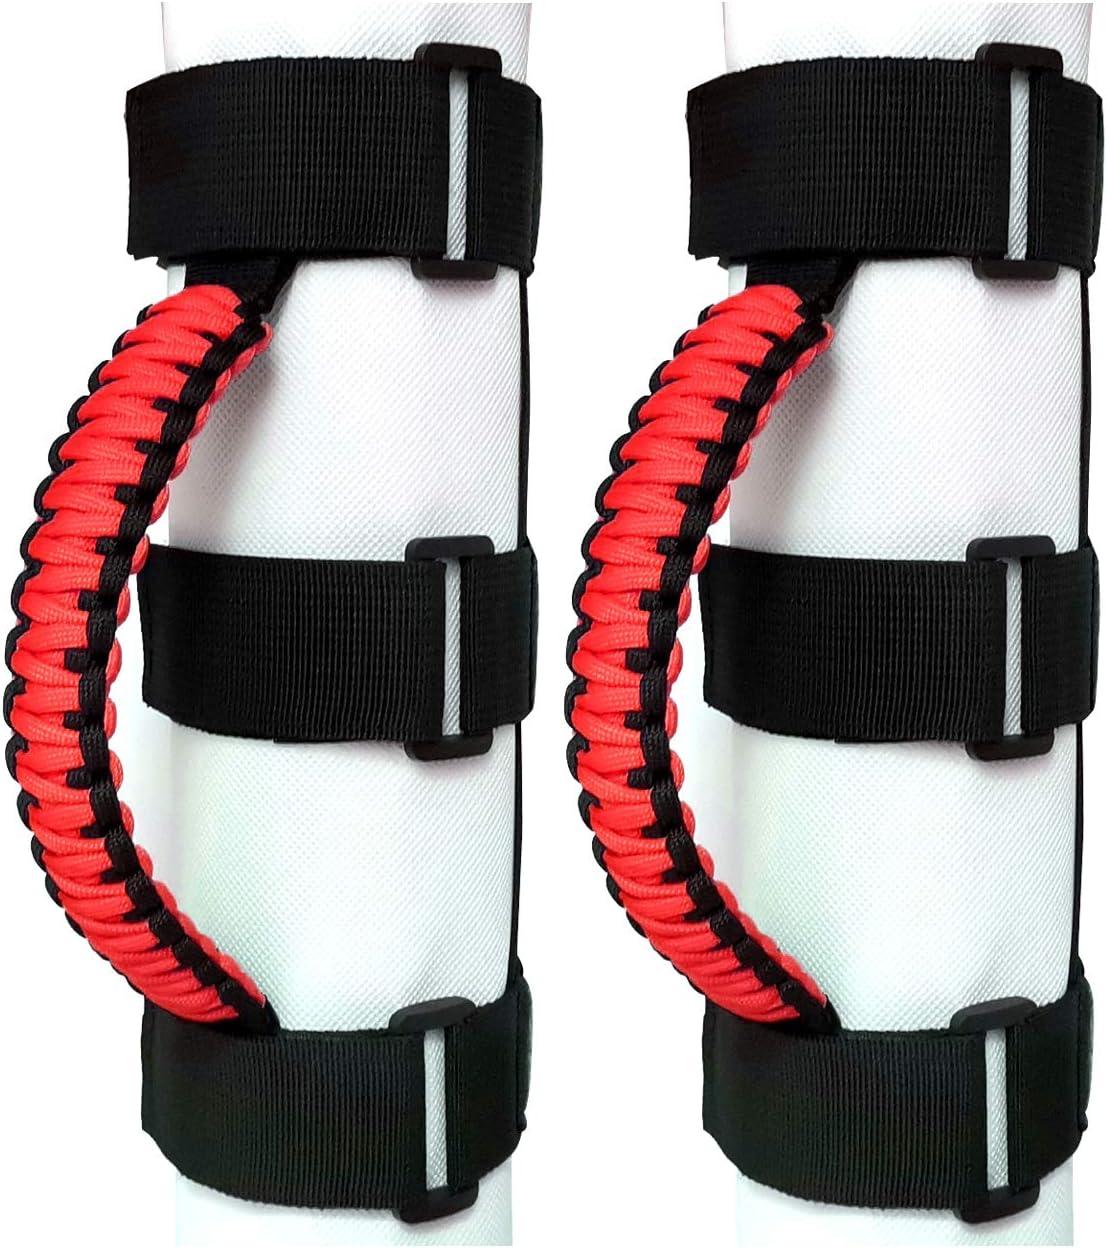 Black//Olive BBUP 2 x Roll Bar Grab Handles Grip Handle for Jeep Wrangler YJ TJ JK JKU JL JLU Sahara Rubicon X Sports Freedom /& Unlimited 1987-2020